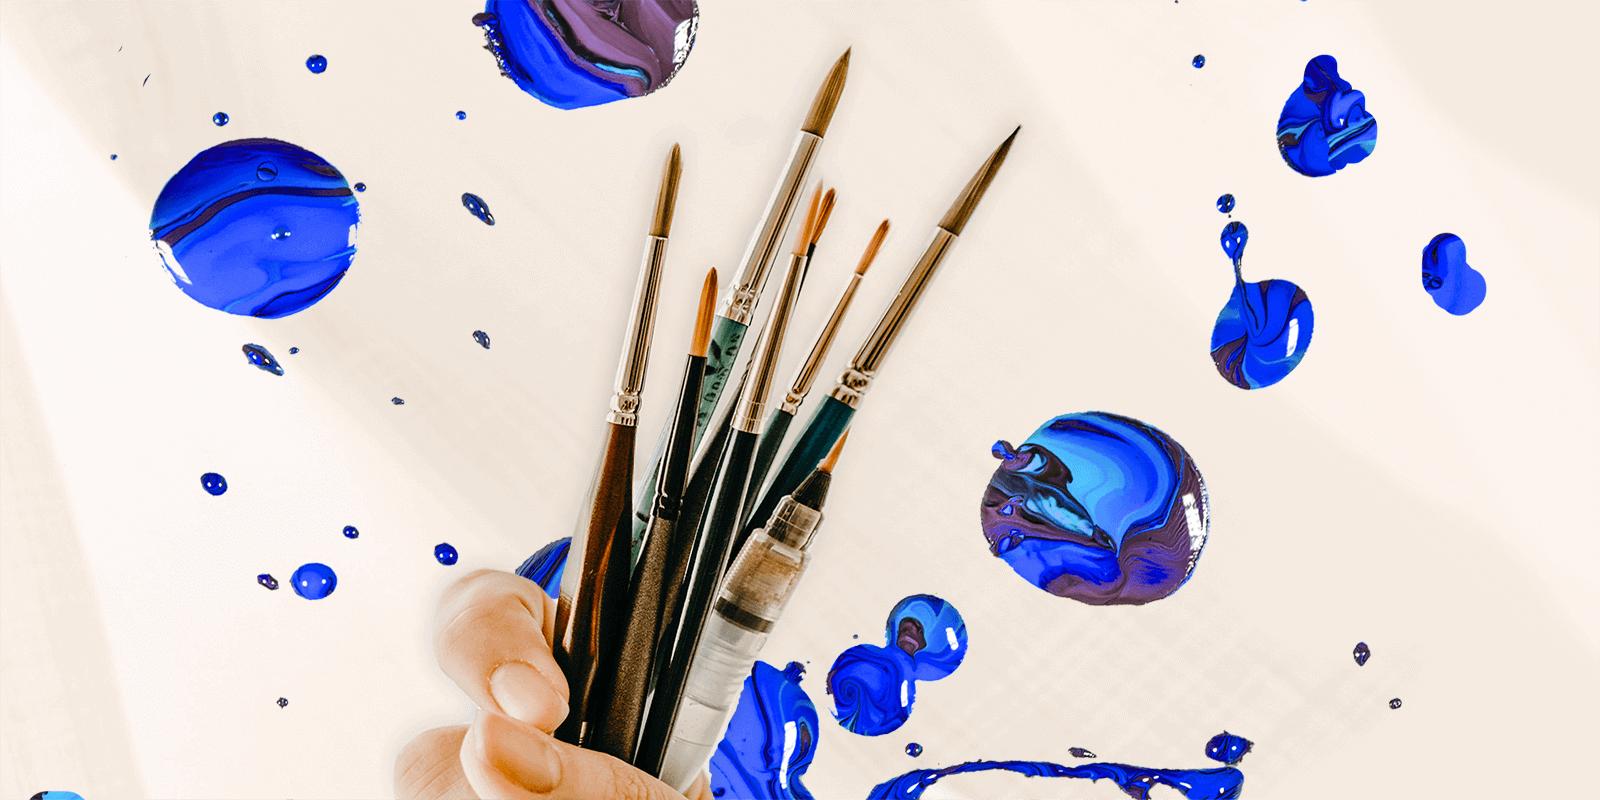 Hand holding paint brushes